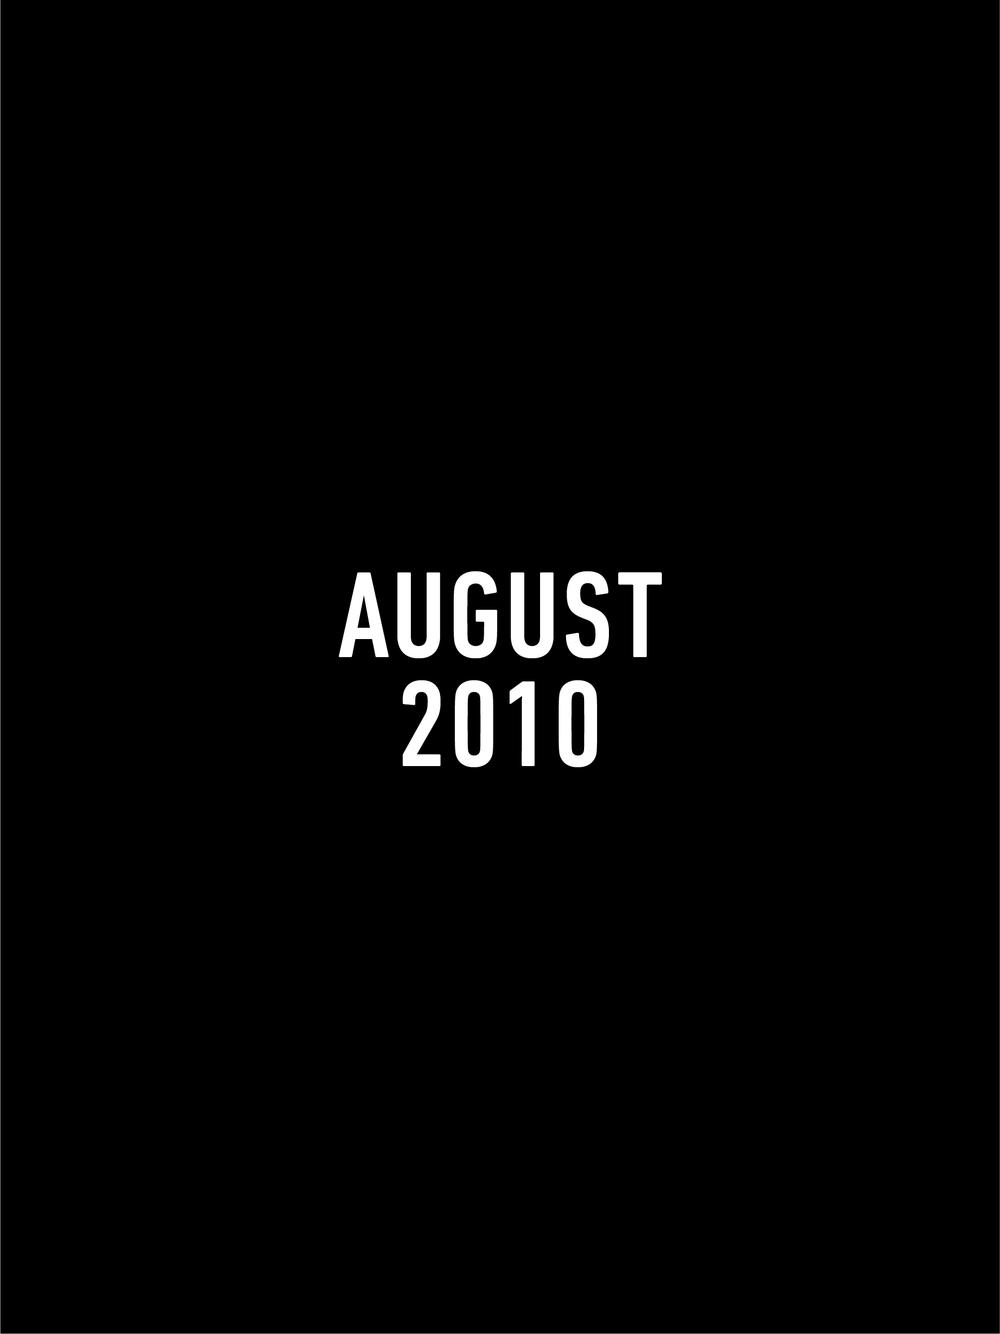 2010 monthly8.jpg